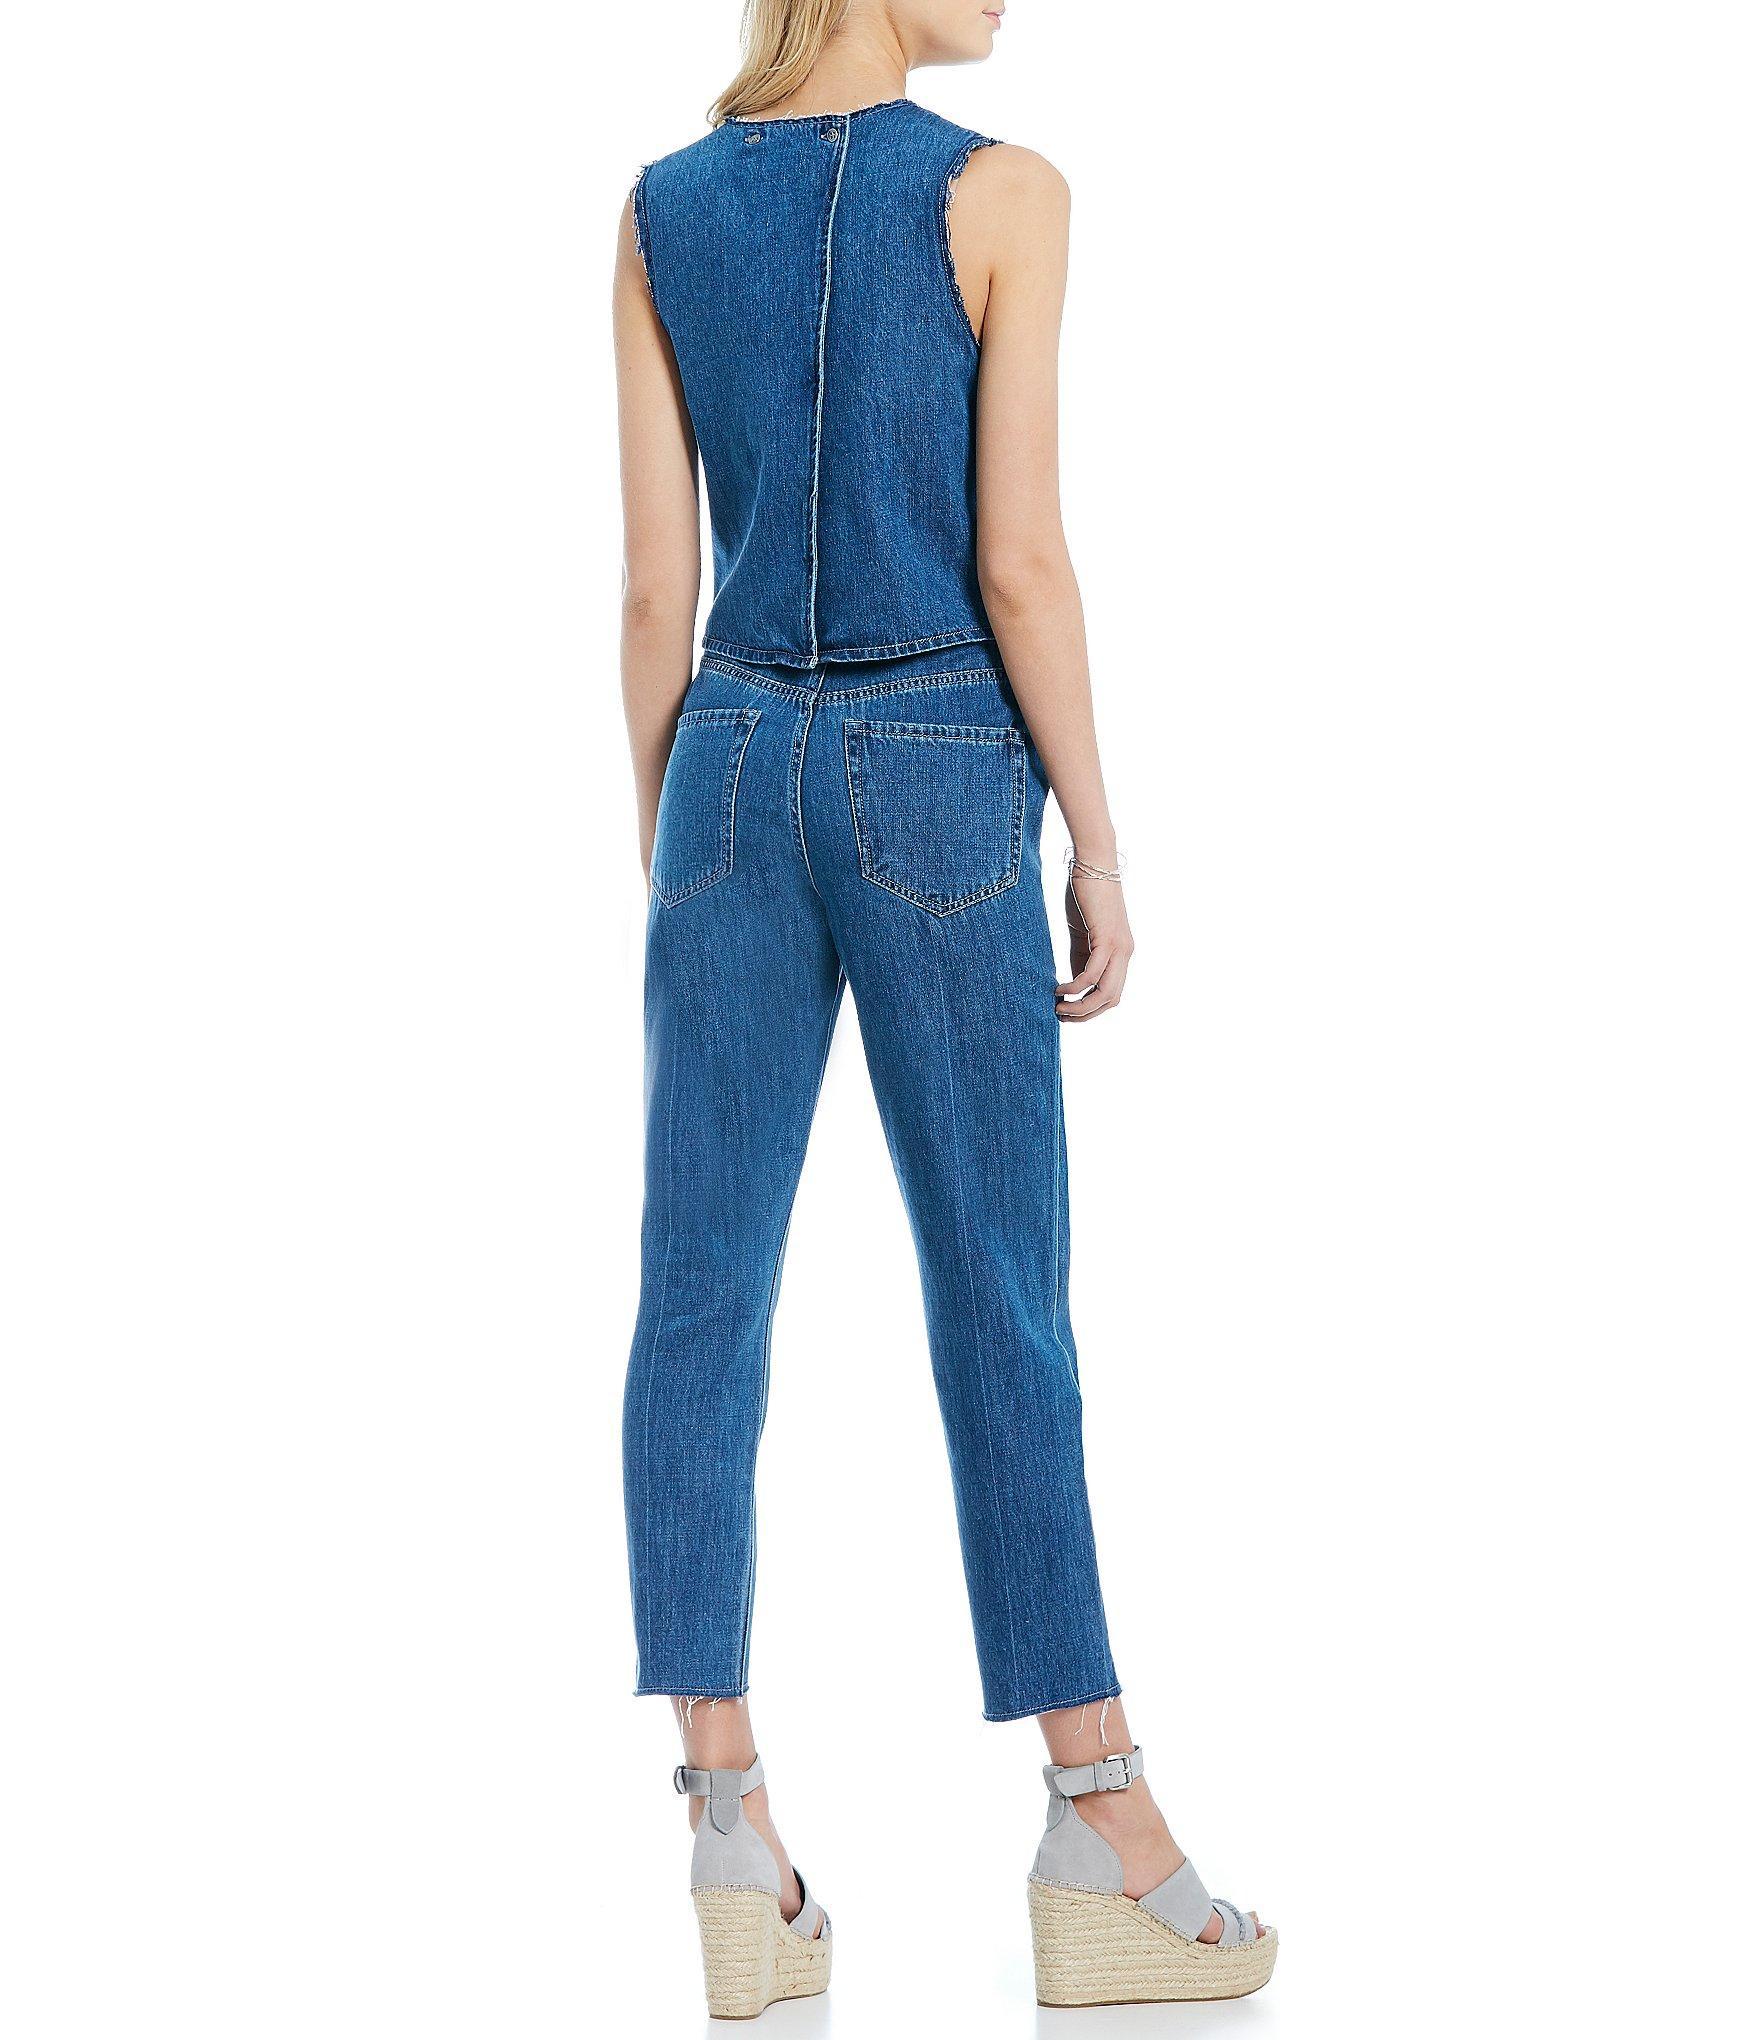 fdc24e10ef75 ... Blue Split Back Jumpsuit - Lyst. View fullscreen